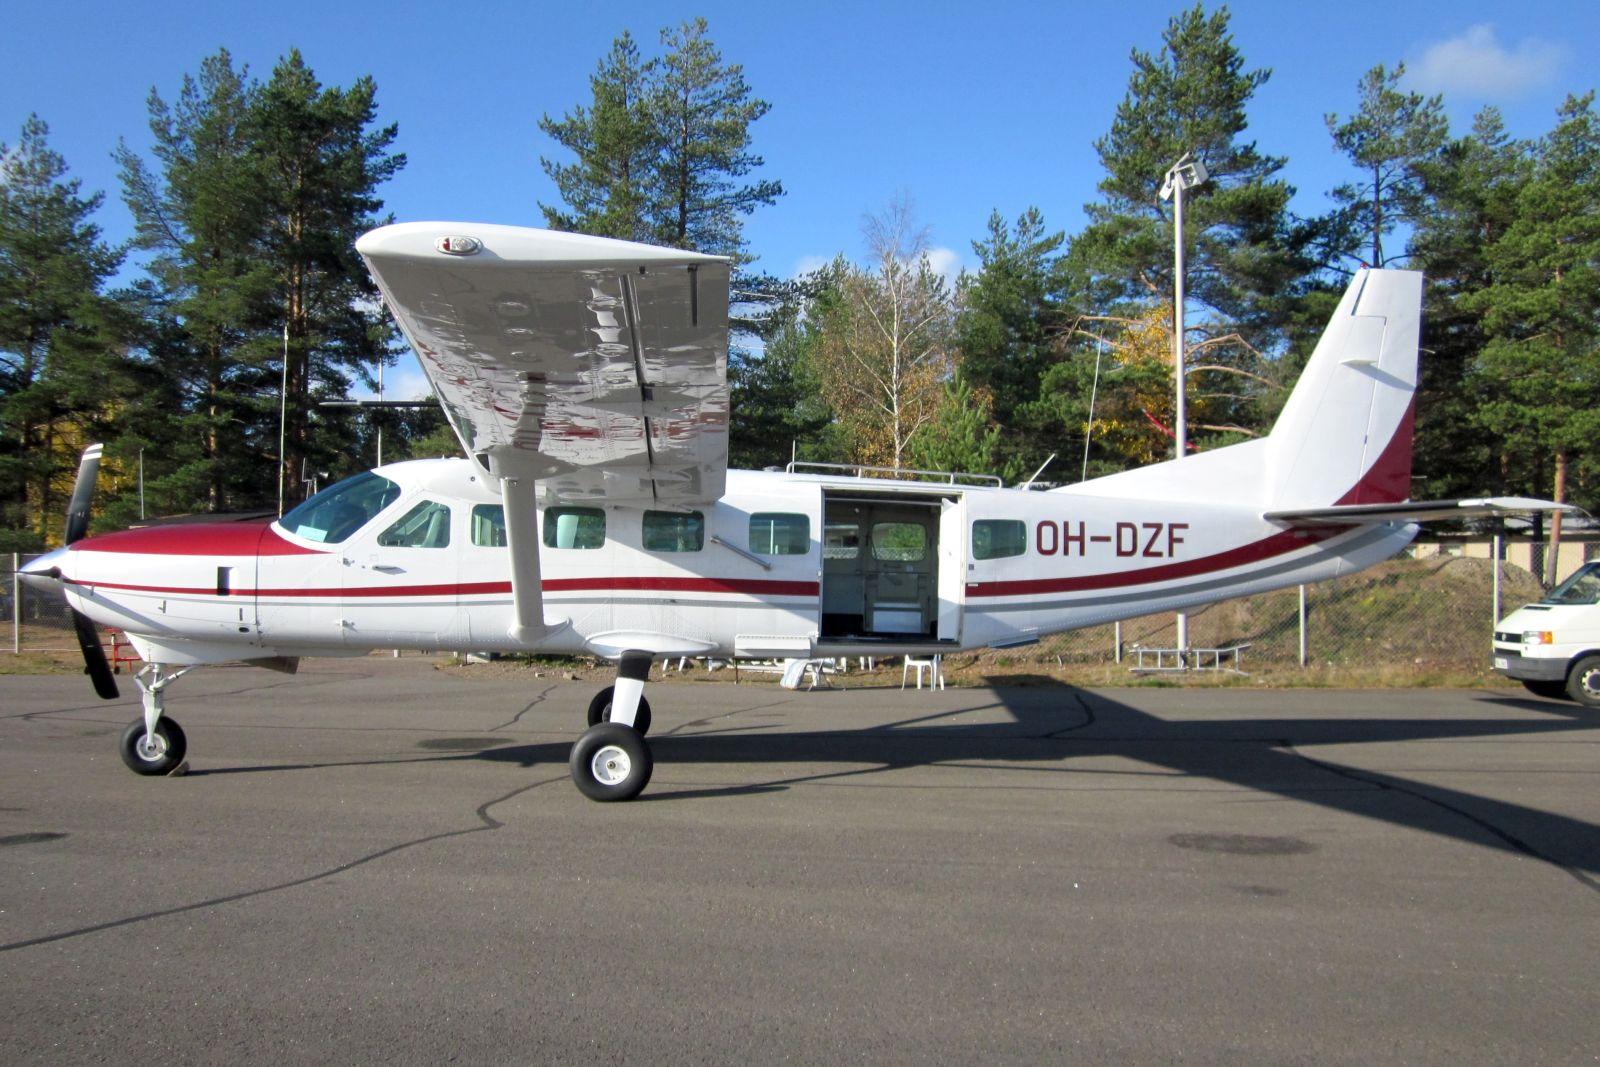 Cessna C208B OH-DZF EFUT 2011-10-09